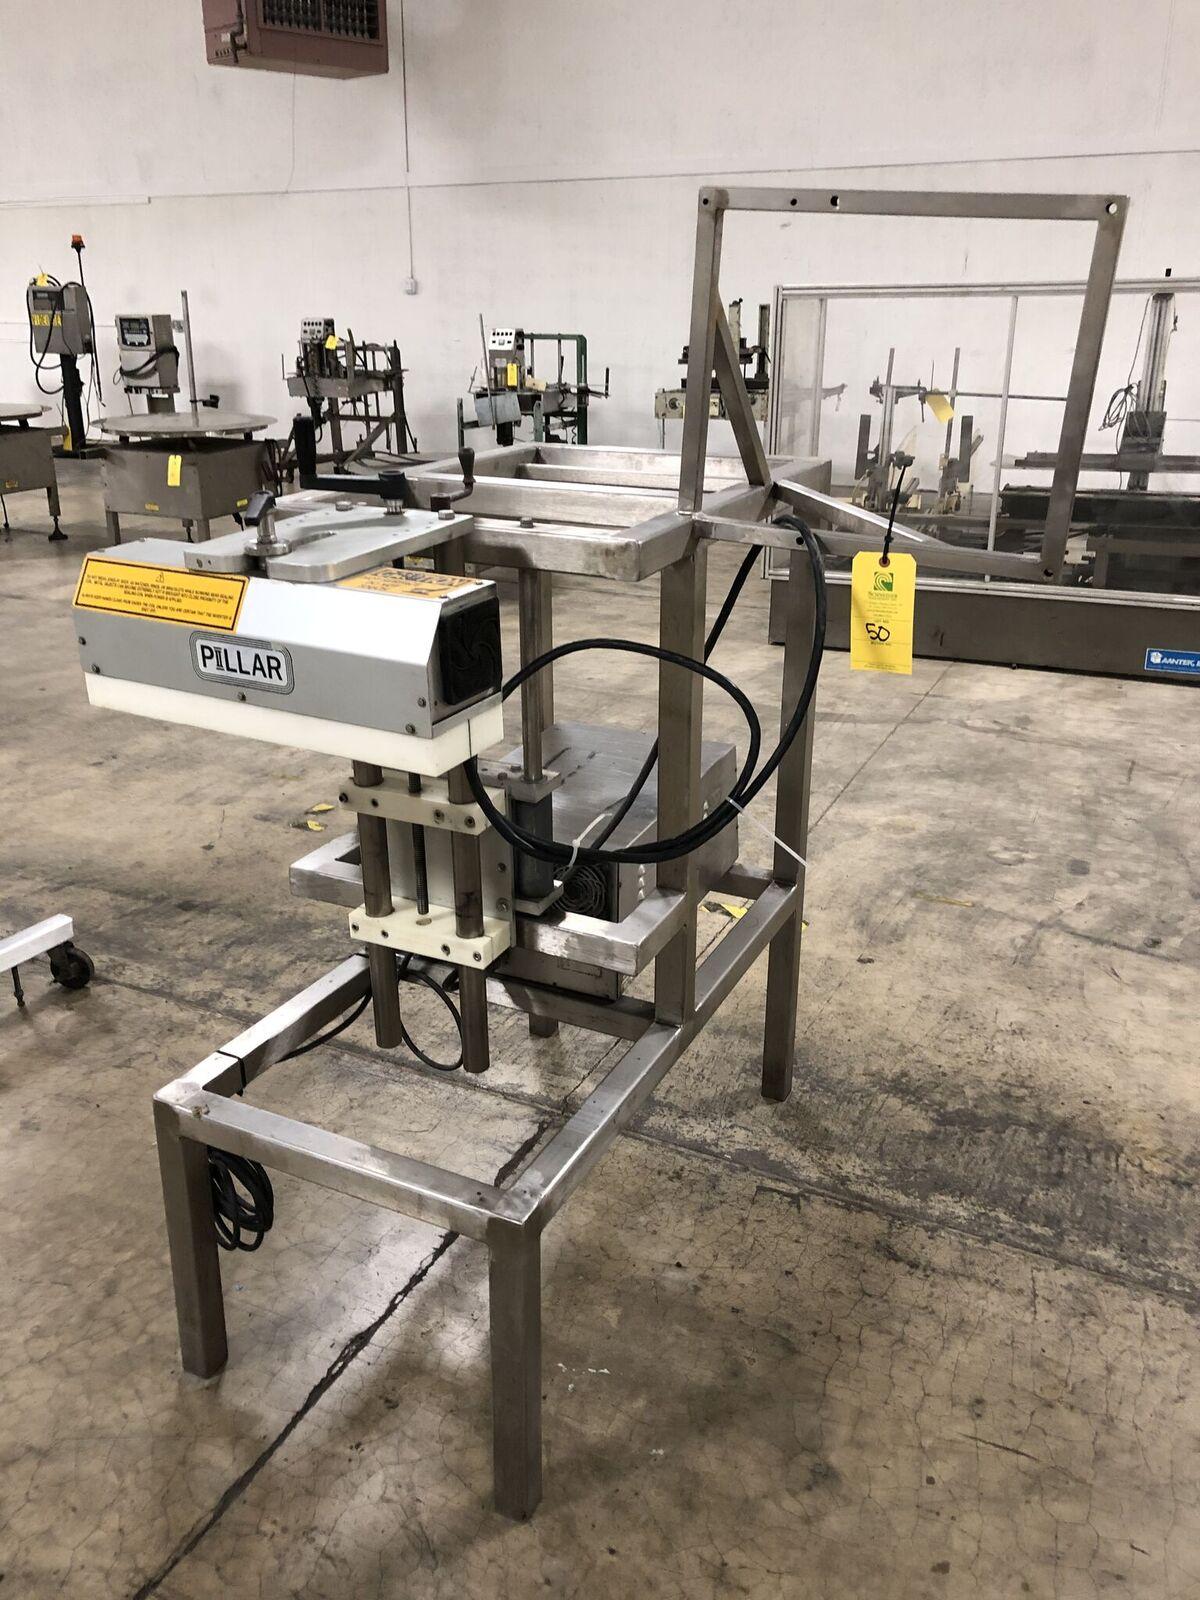 Pillar Technologies Unifoiler Cap Sealing Machine, Model #U1P1001000000, DOM April 2009